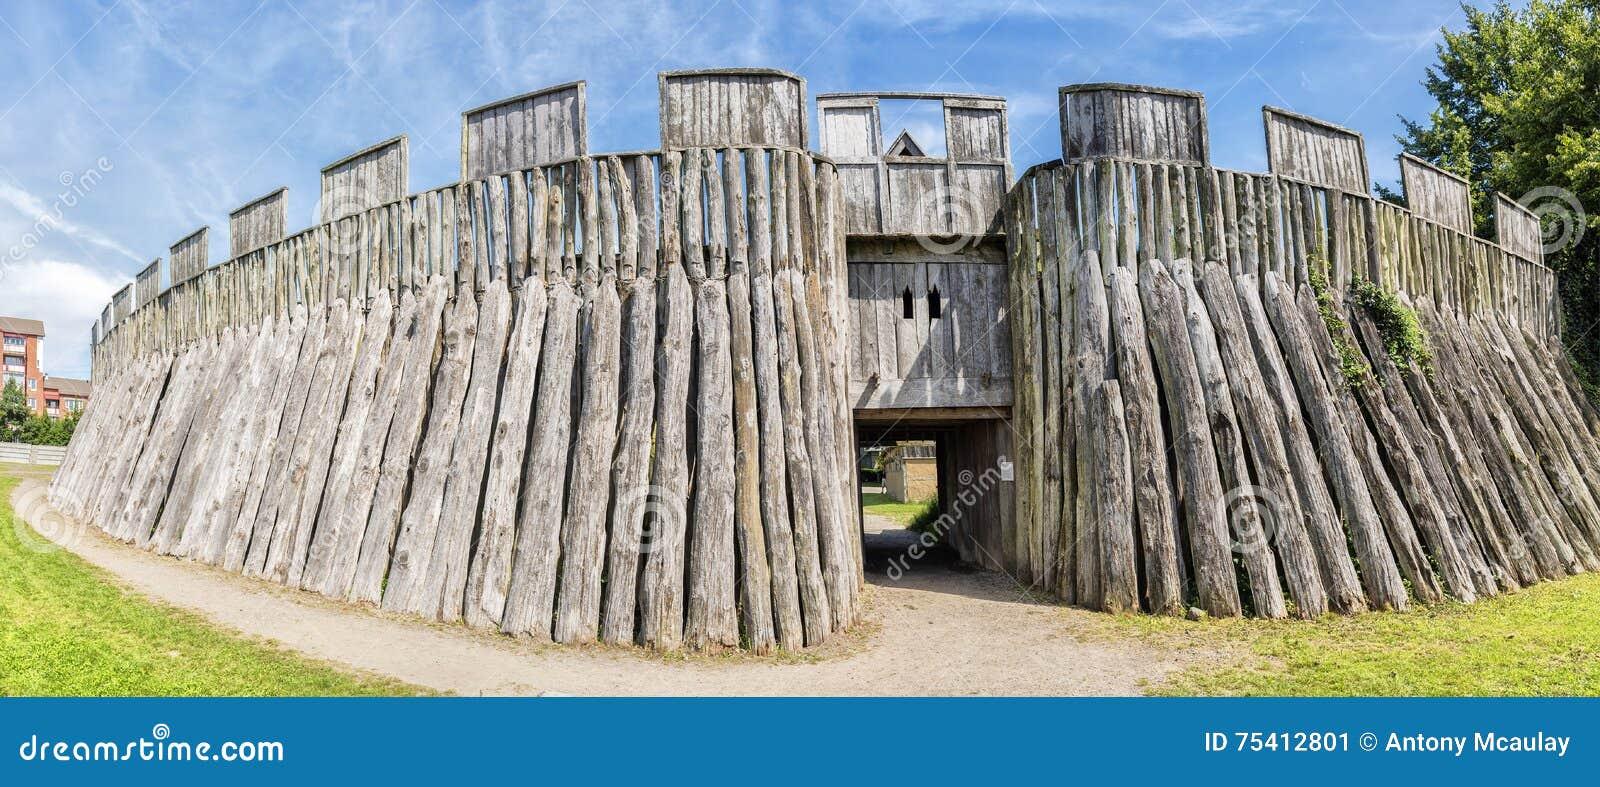 Trelleborg Viking Fort Stock Photo Image 75412801